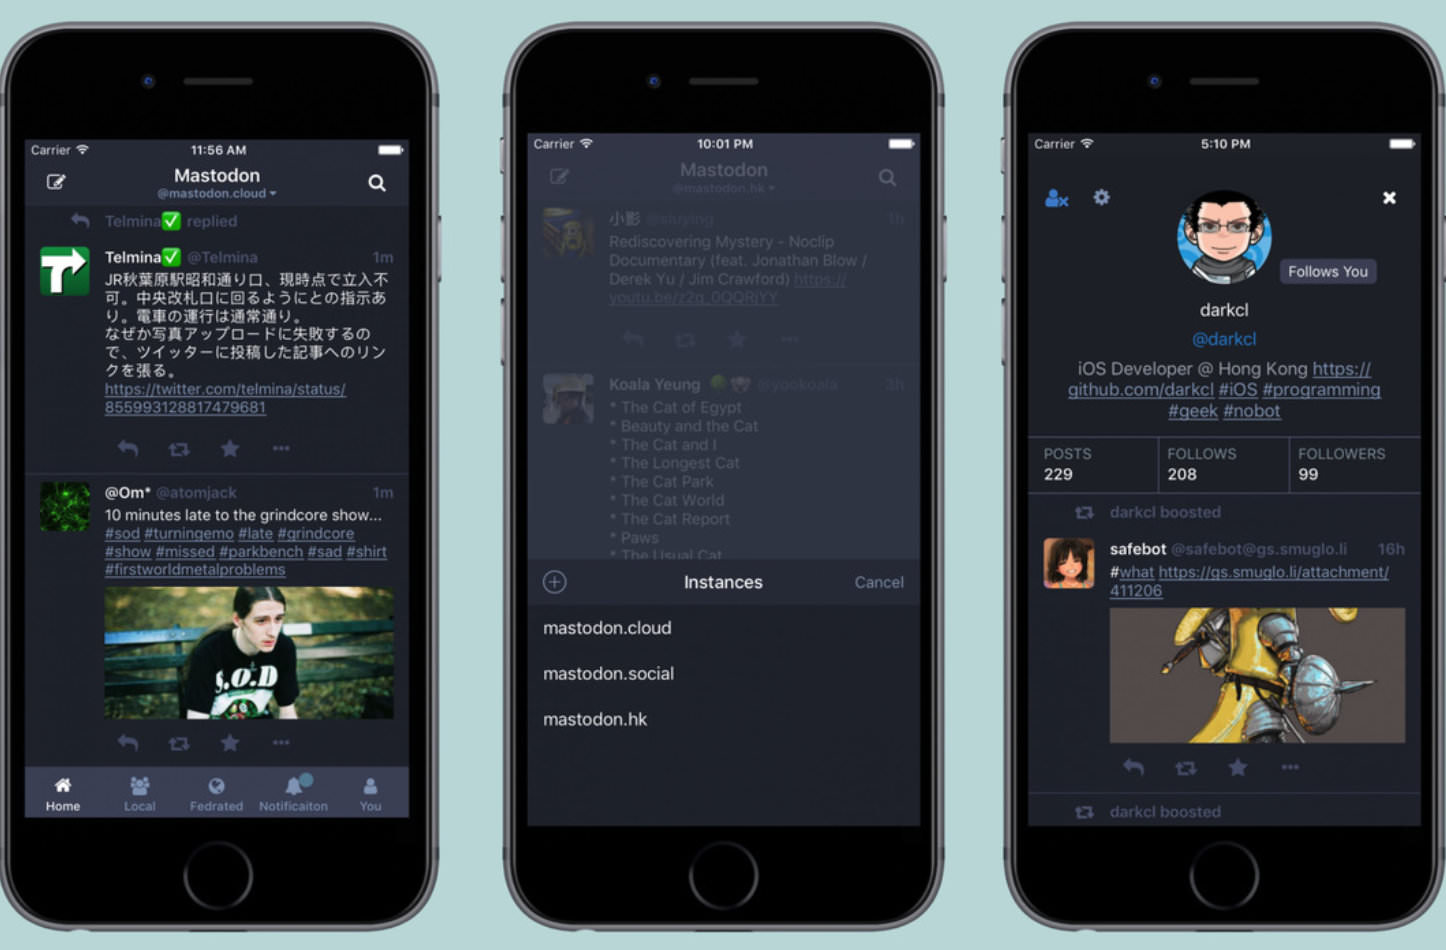 Mastodon iOS